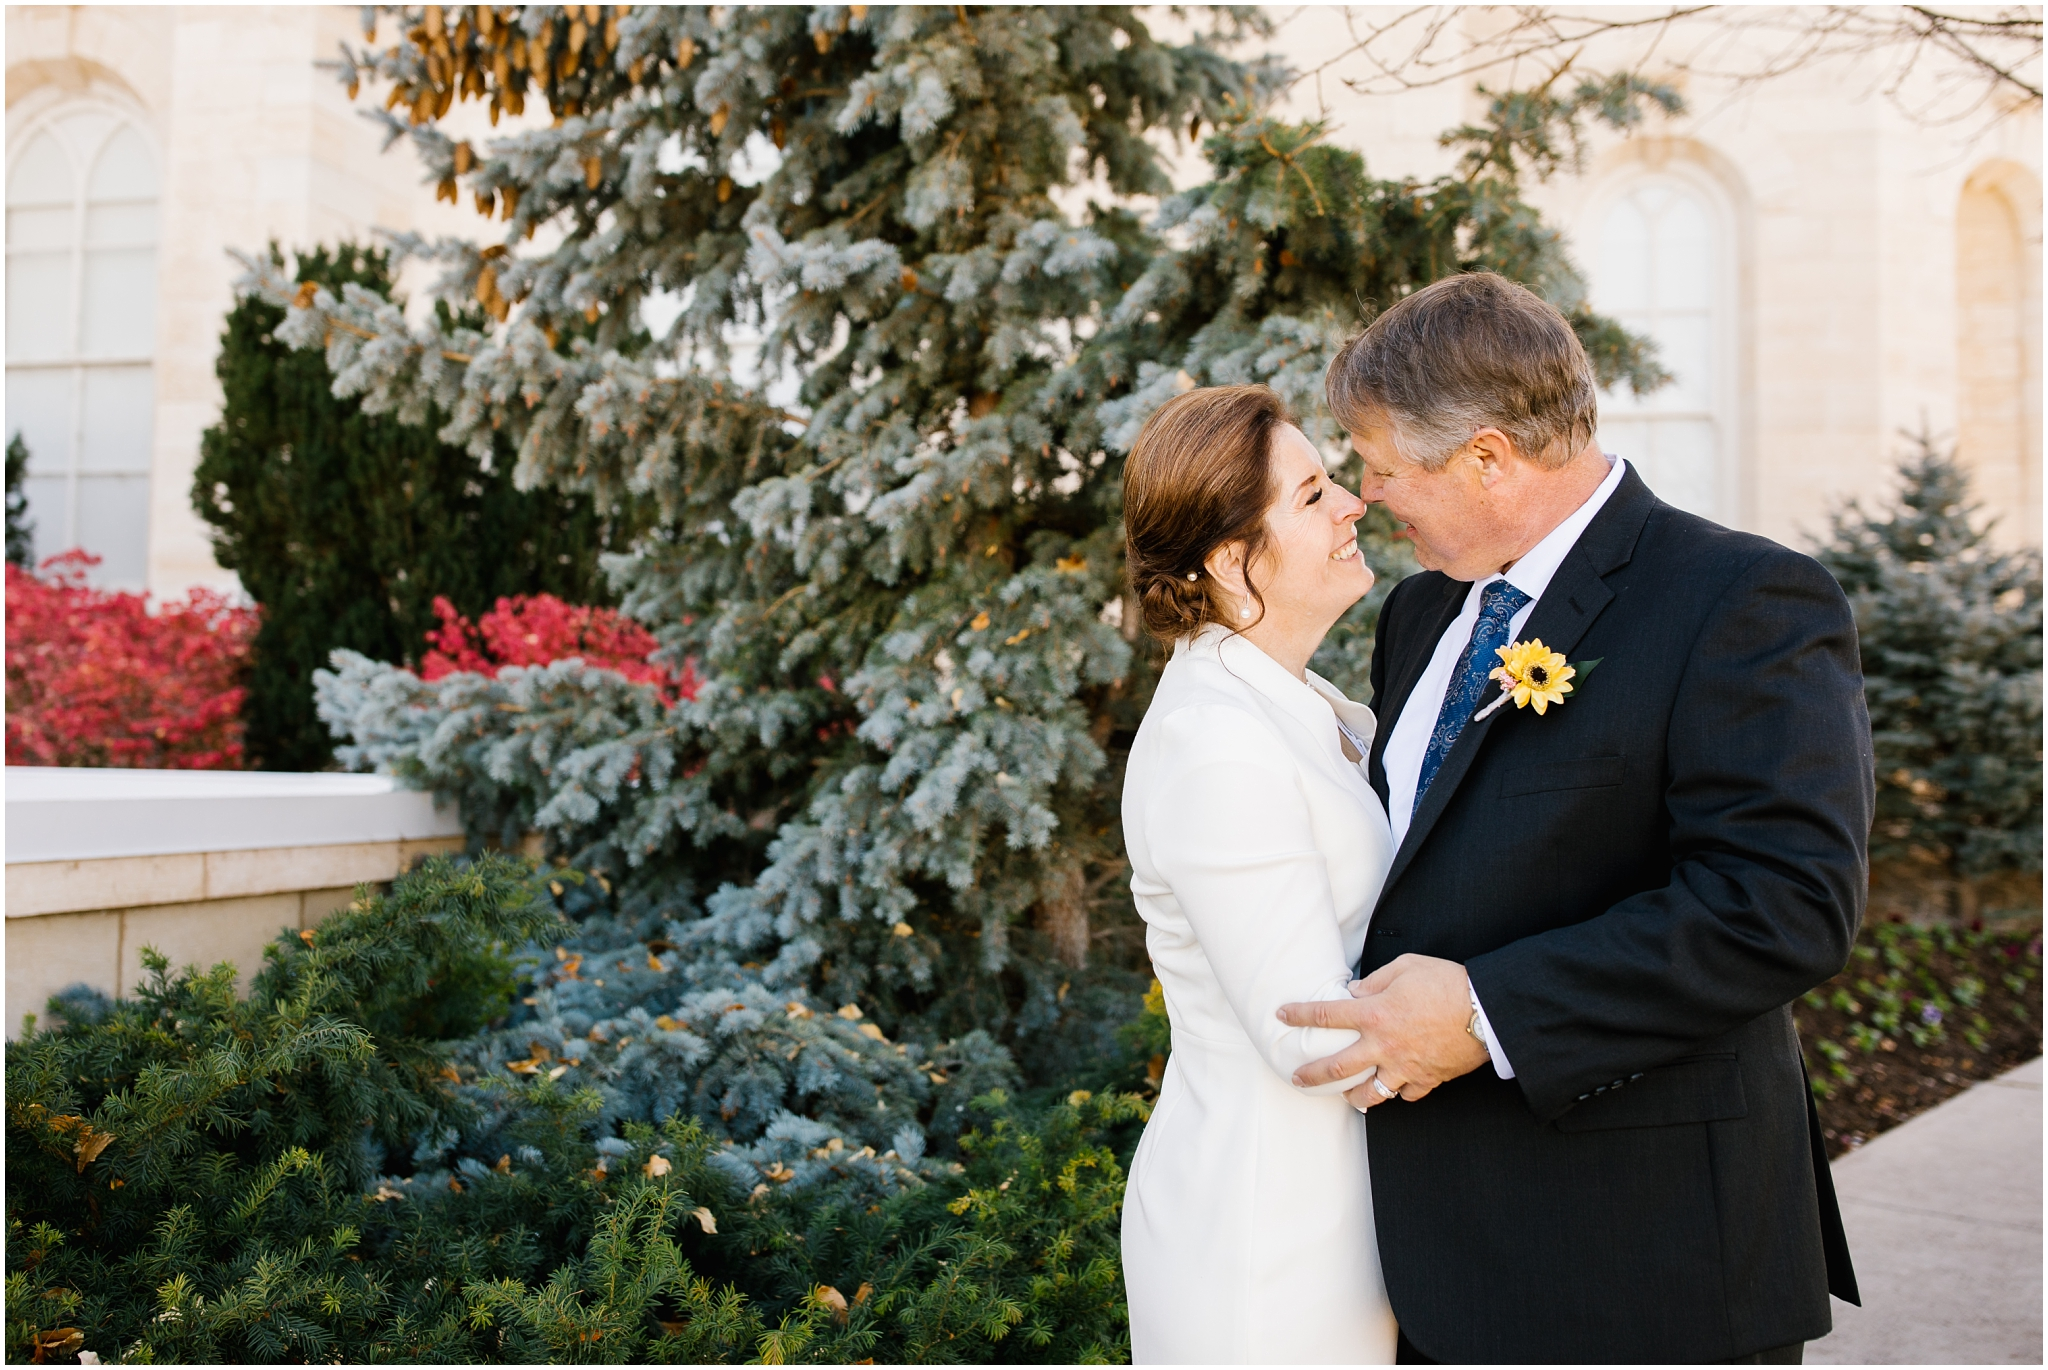 PDWeddingDay-125_Lizzie-B-Imagery-Utah-Wedding-Photographer-Salt-Lake-City-Park-City-Utah-County-Manti-Temple.jpg